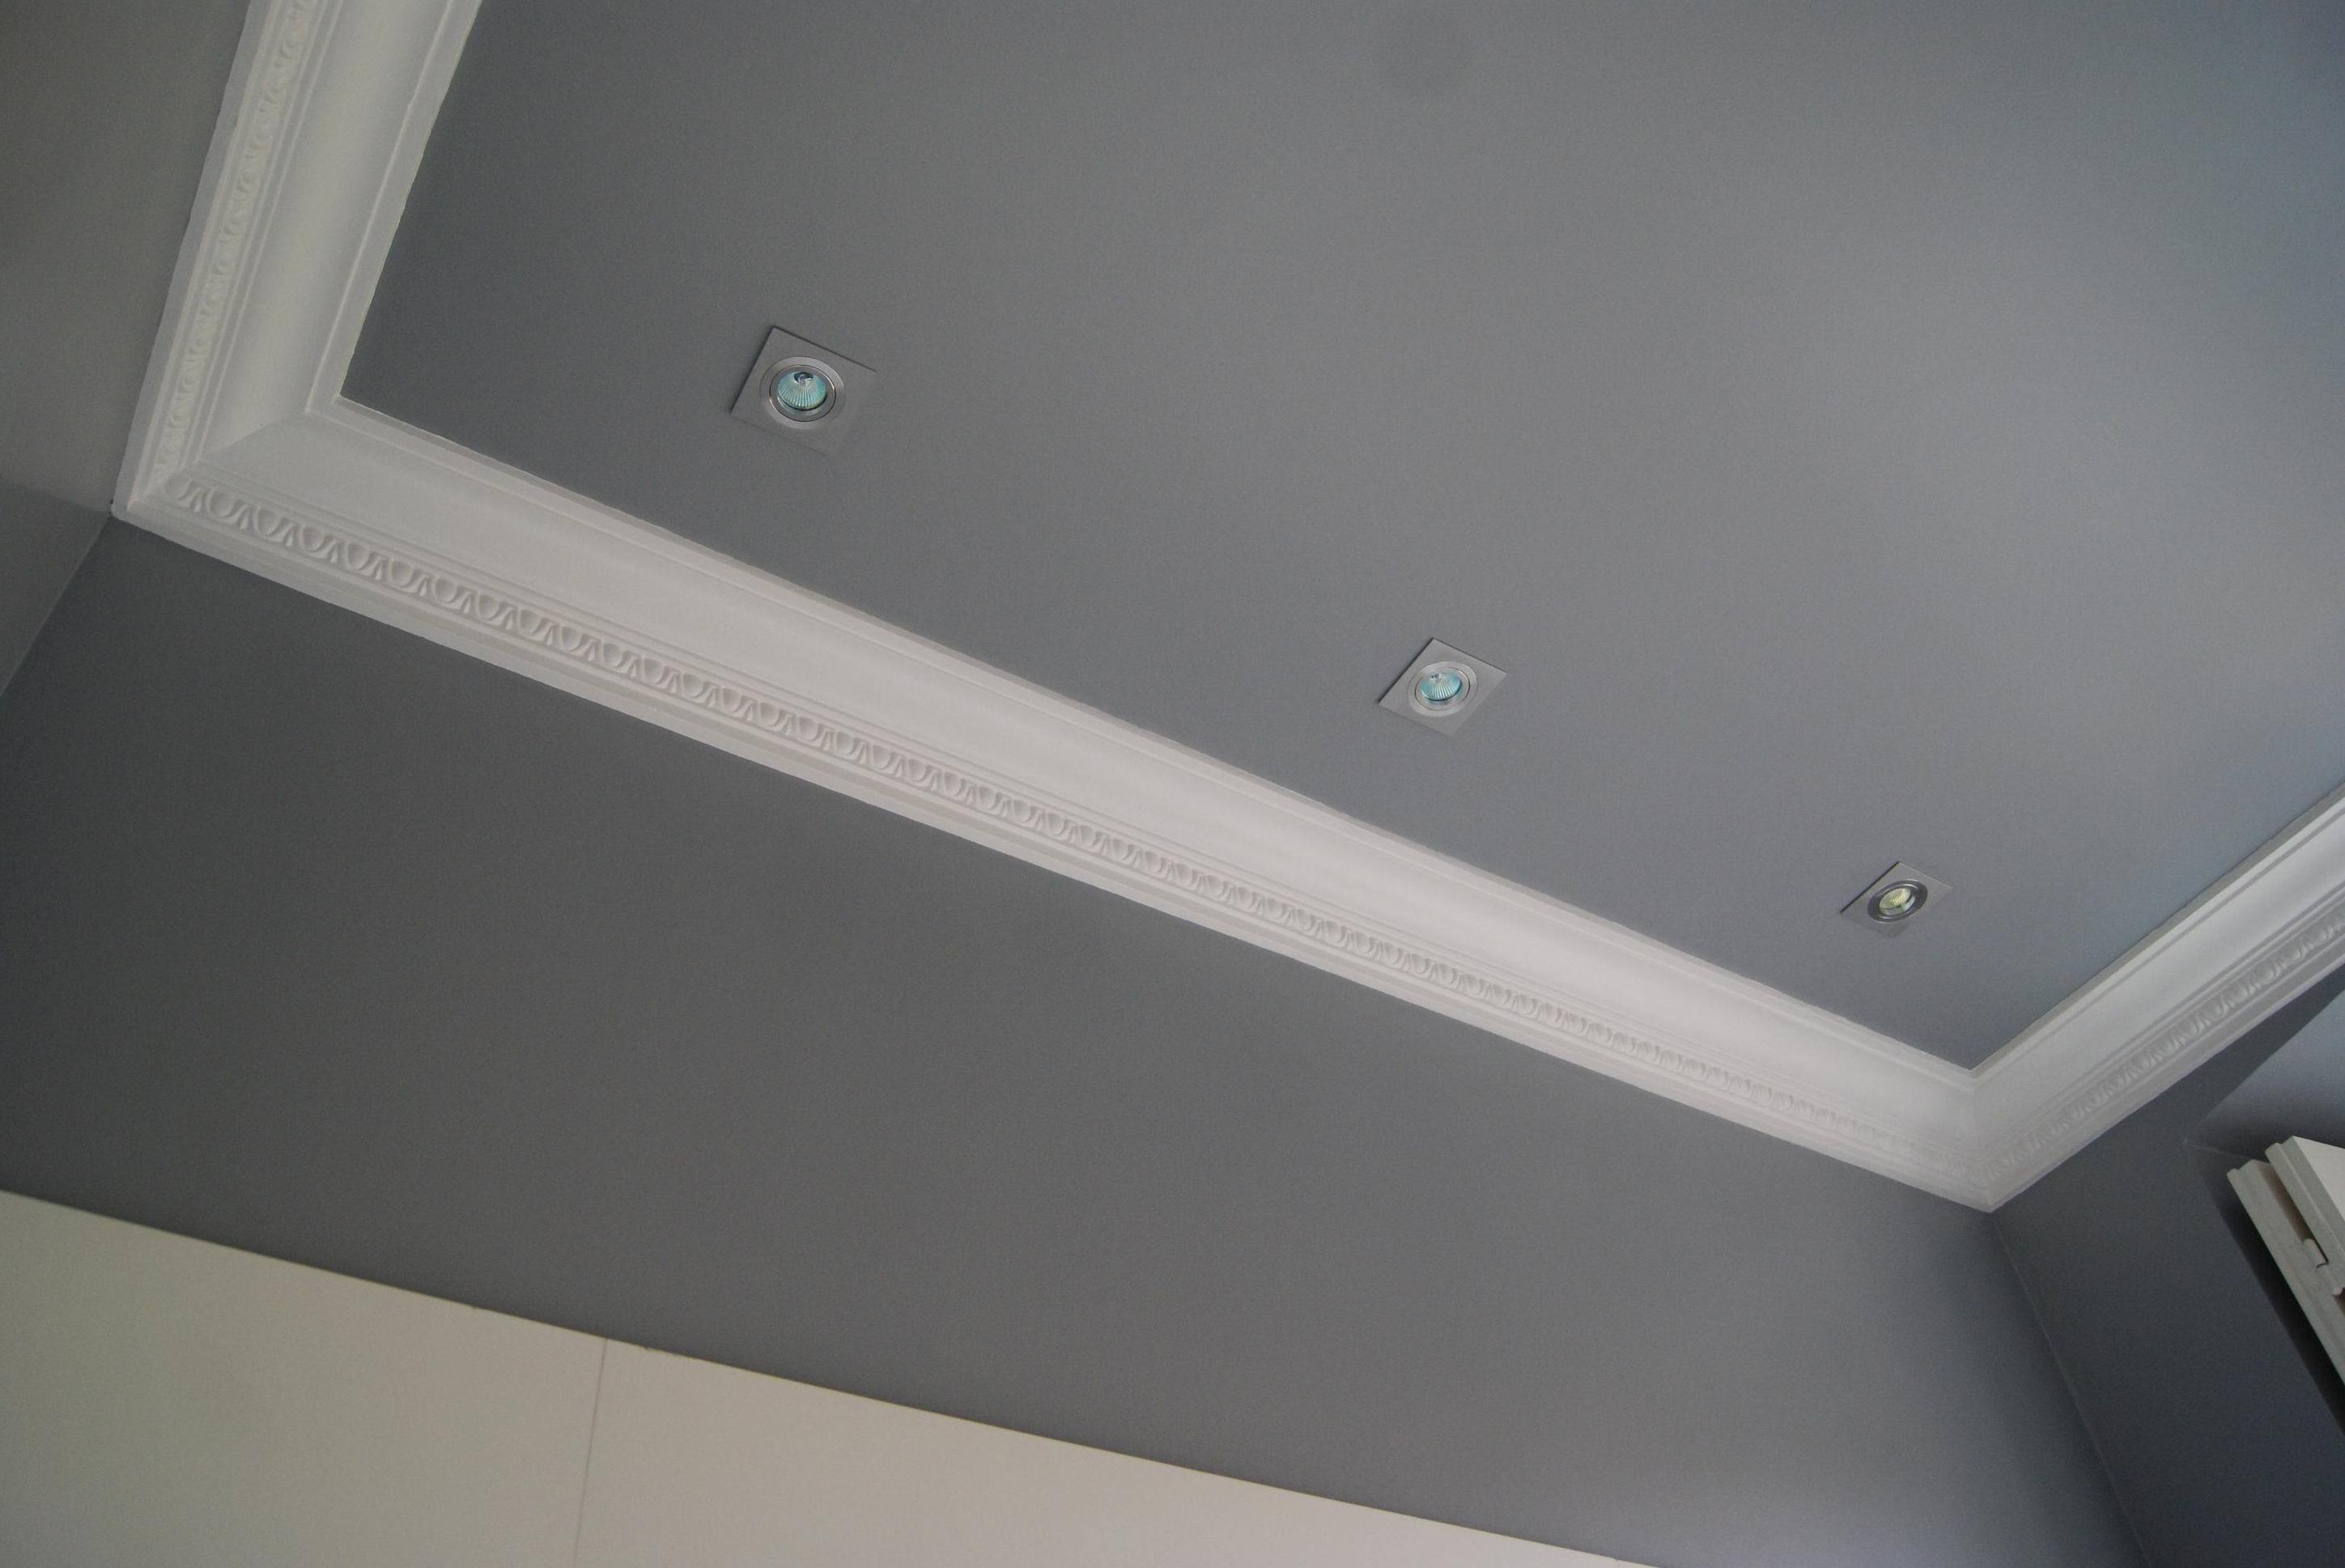 Techos de escayola modernos elegant bao moderno techo for Techos de escayola modernos